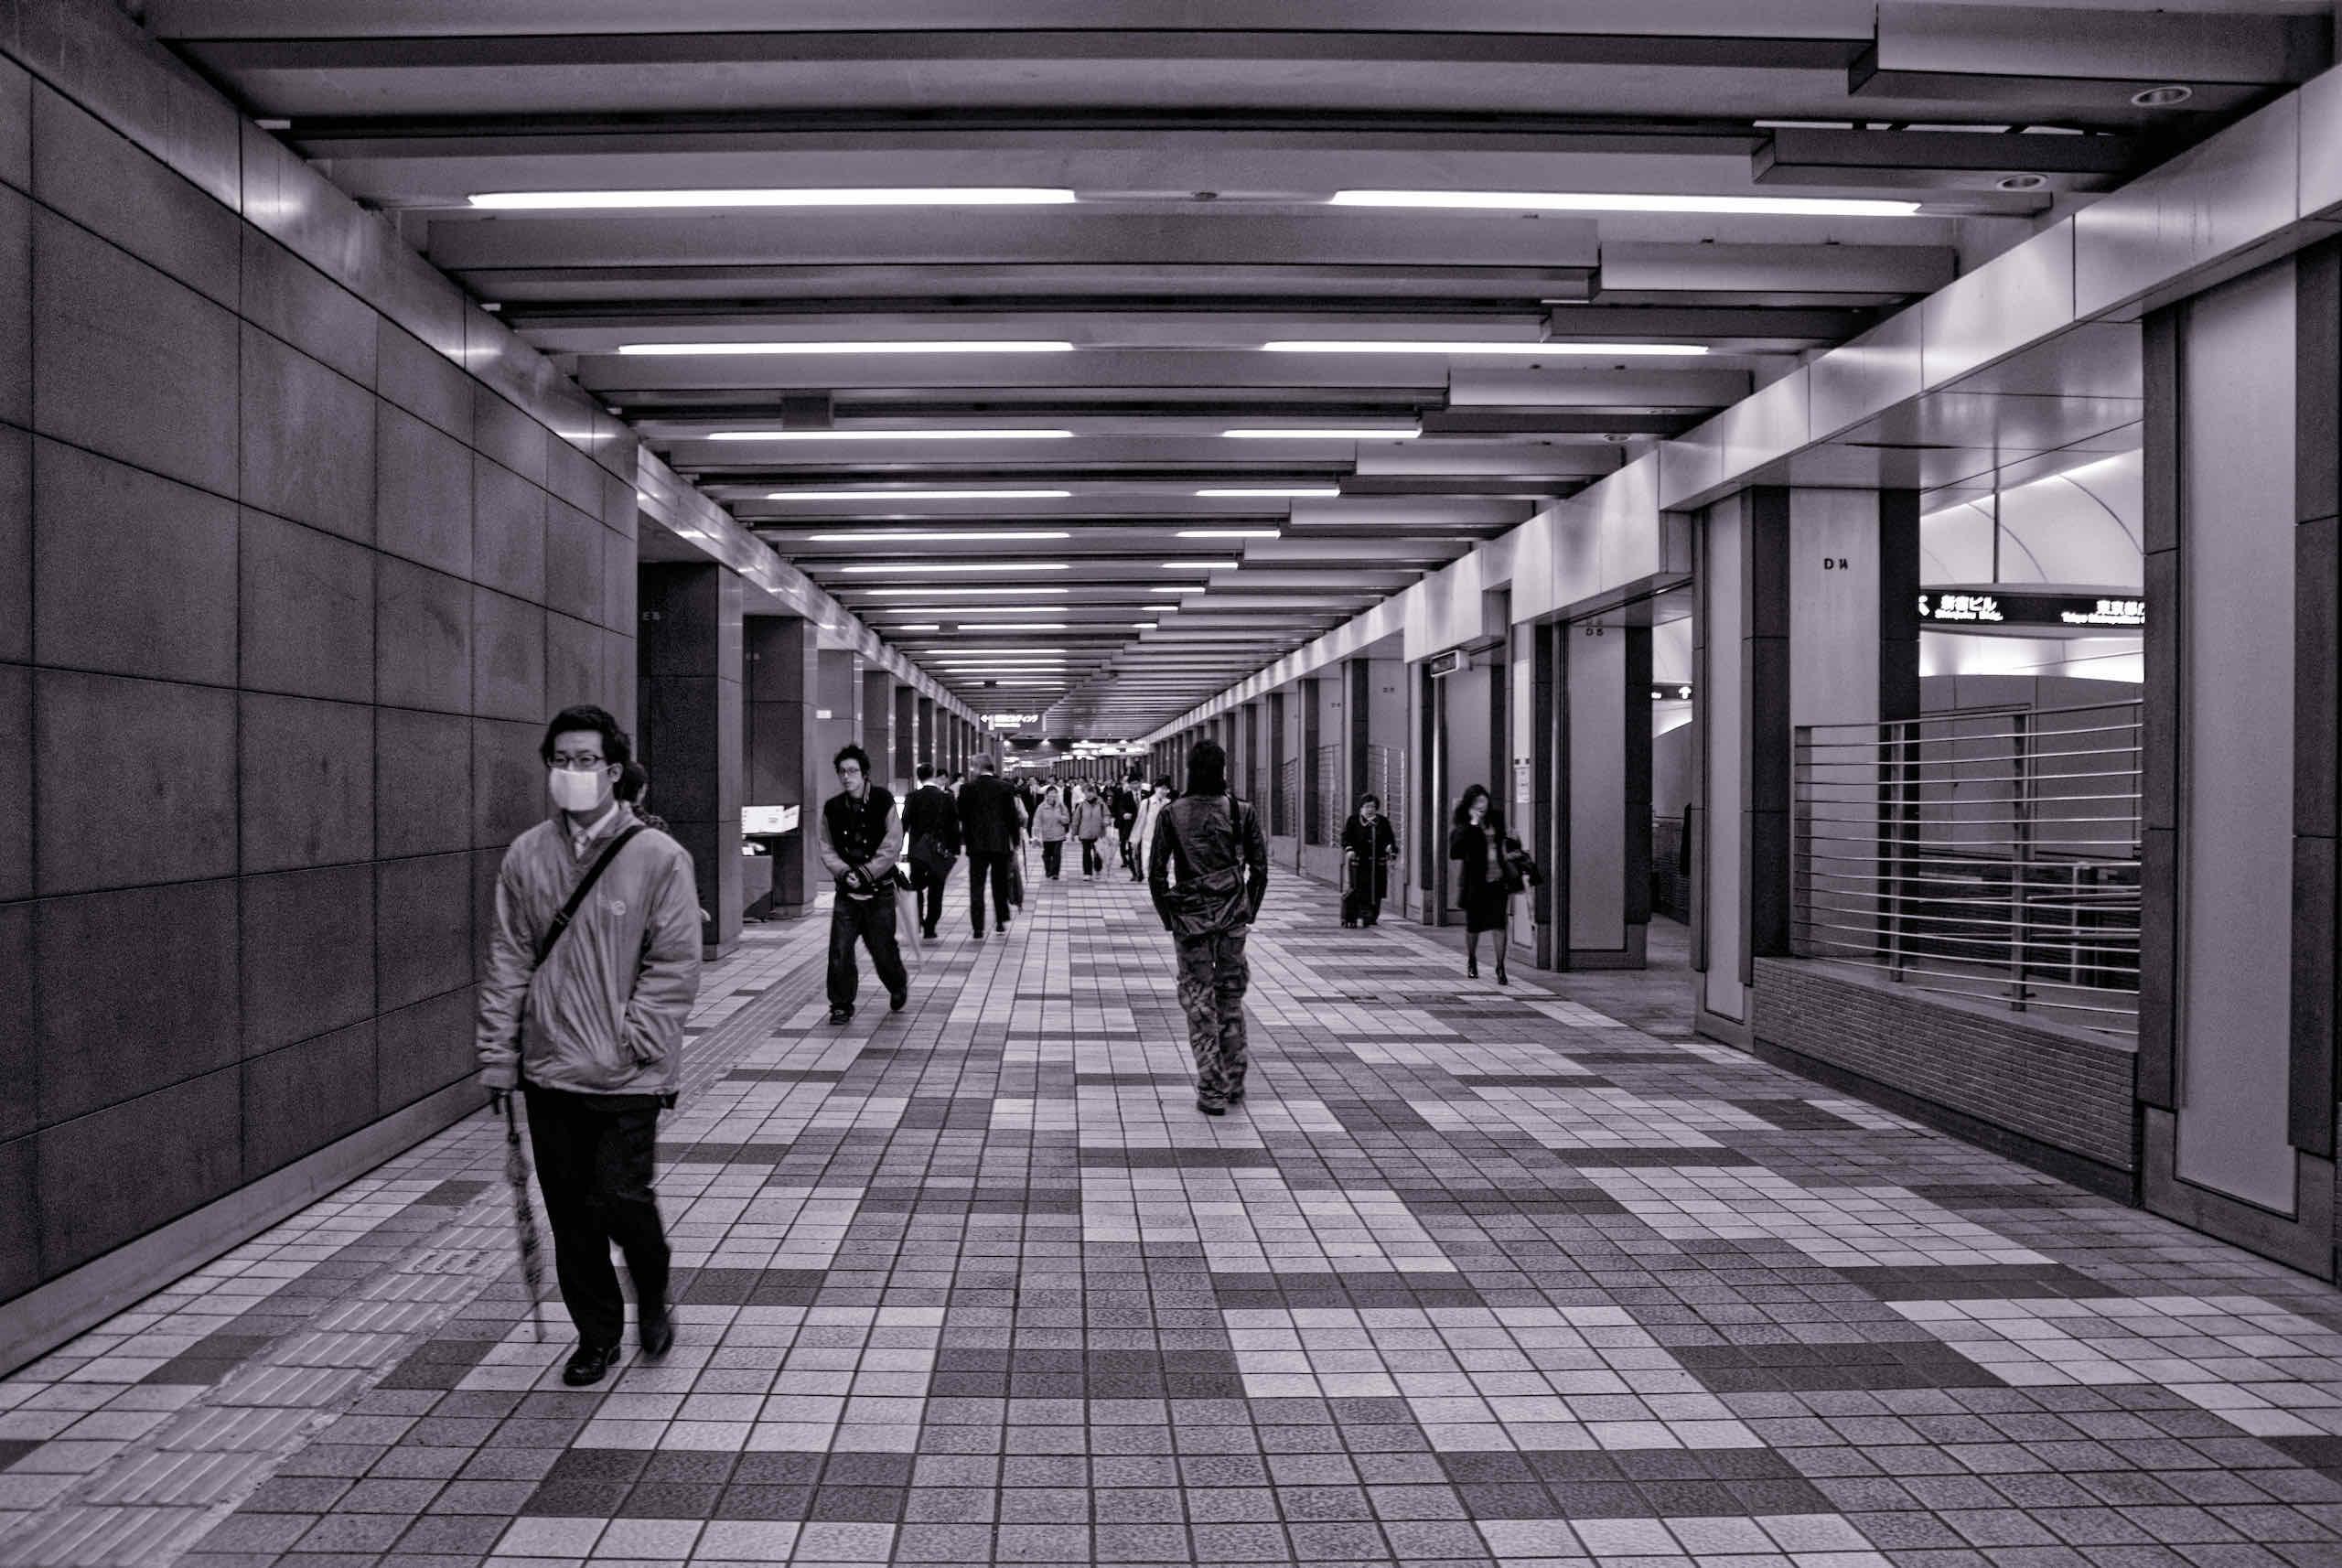 underground mall underneath chuo doori (中央通りの地下街で)